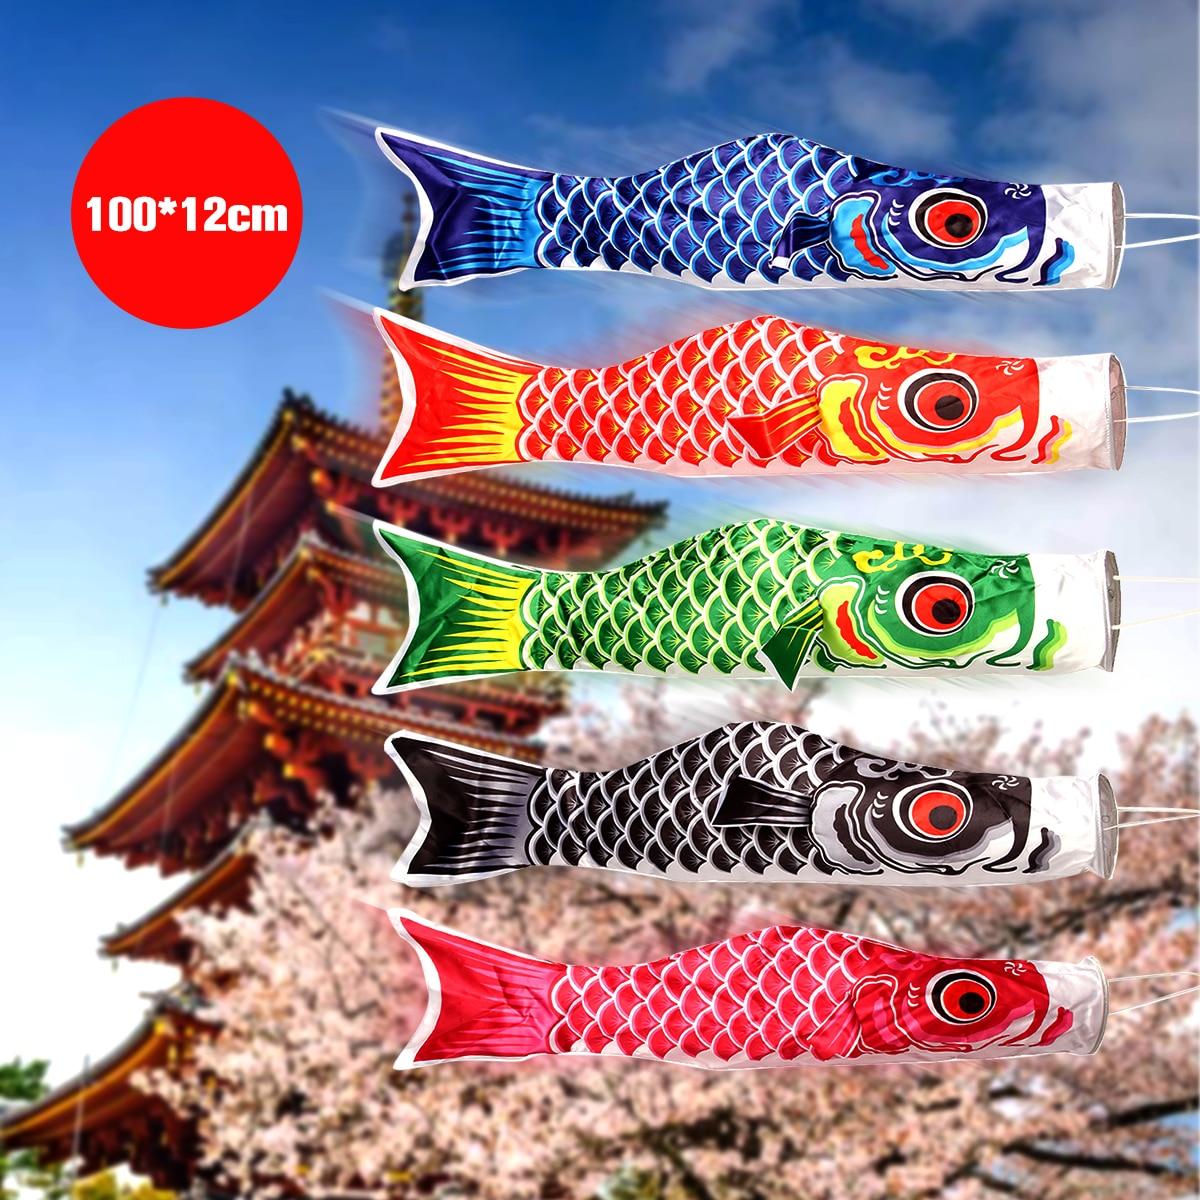 5 Colors 100cm Waterproof Japanese Carp Windsock Streamer Hanging Fish Flag Decor Kite Koi Nobori For Children